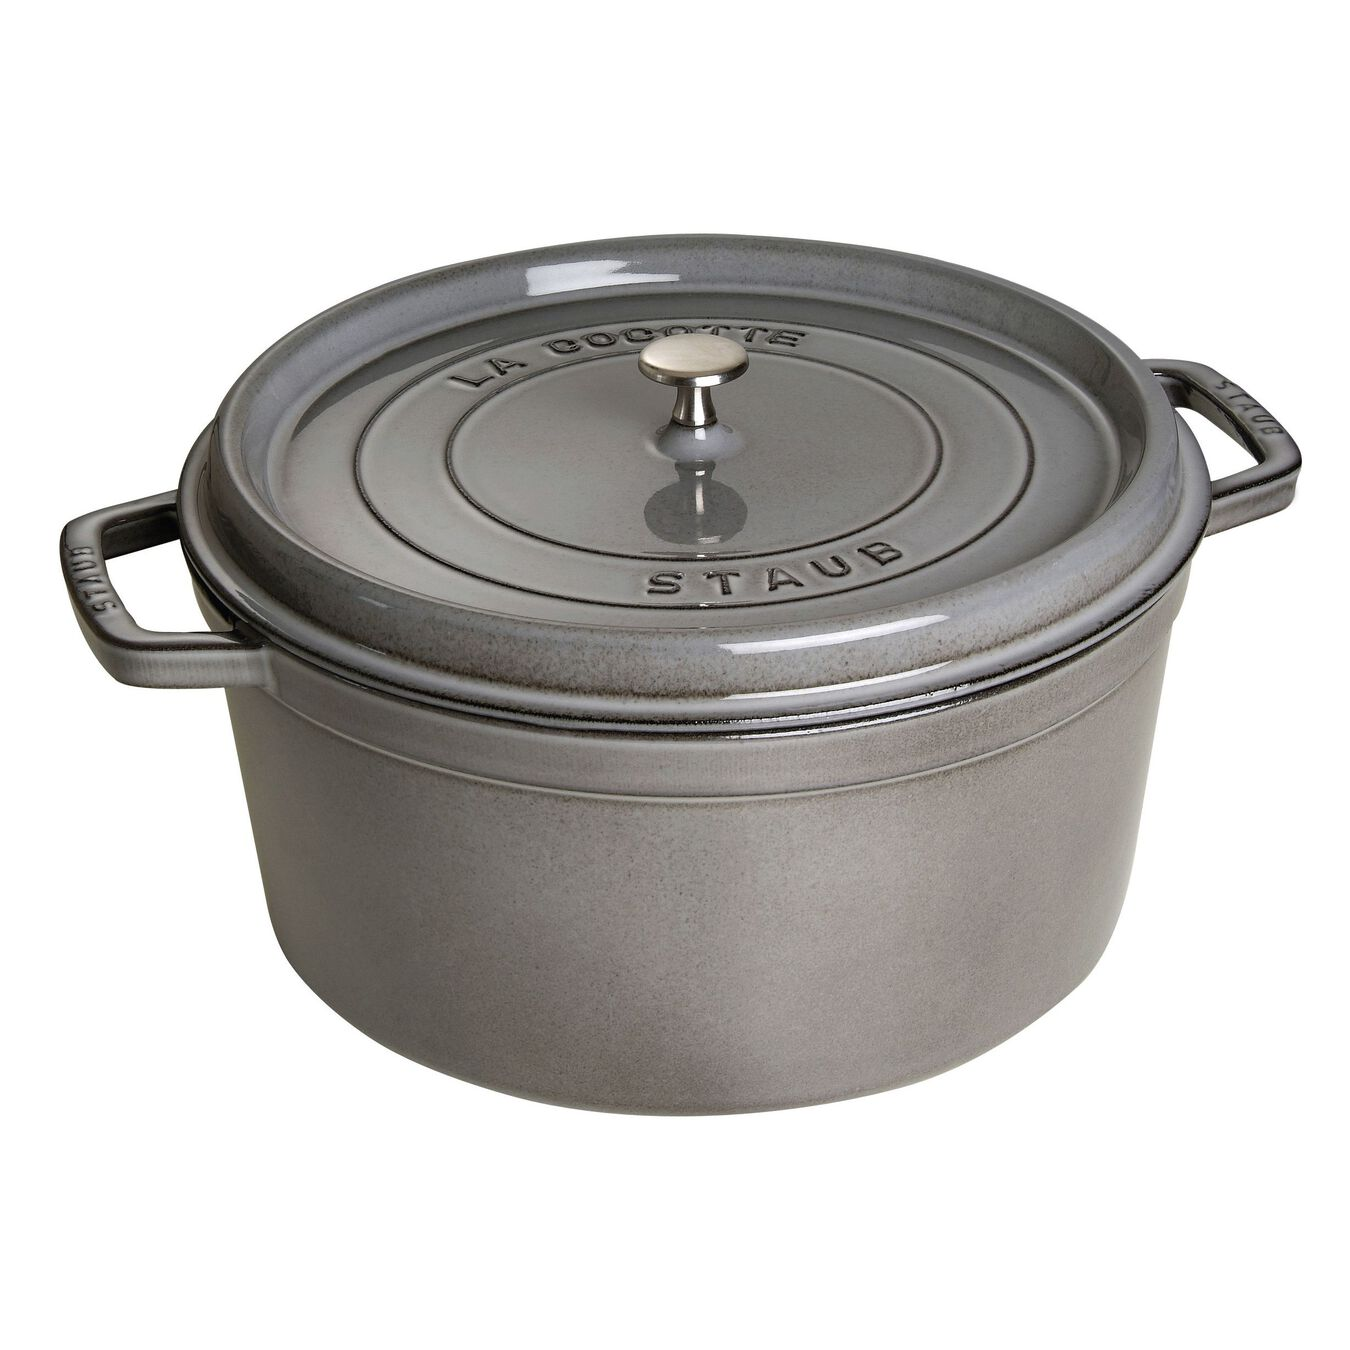 Cocotte rotonda - 30 cm, Colore grigio grafite,,large 1